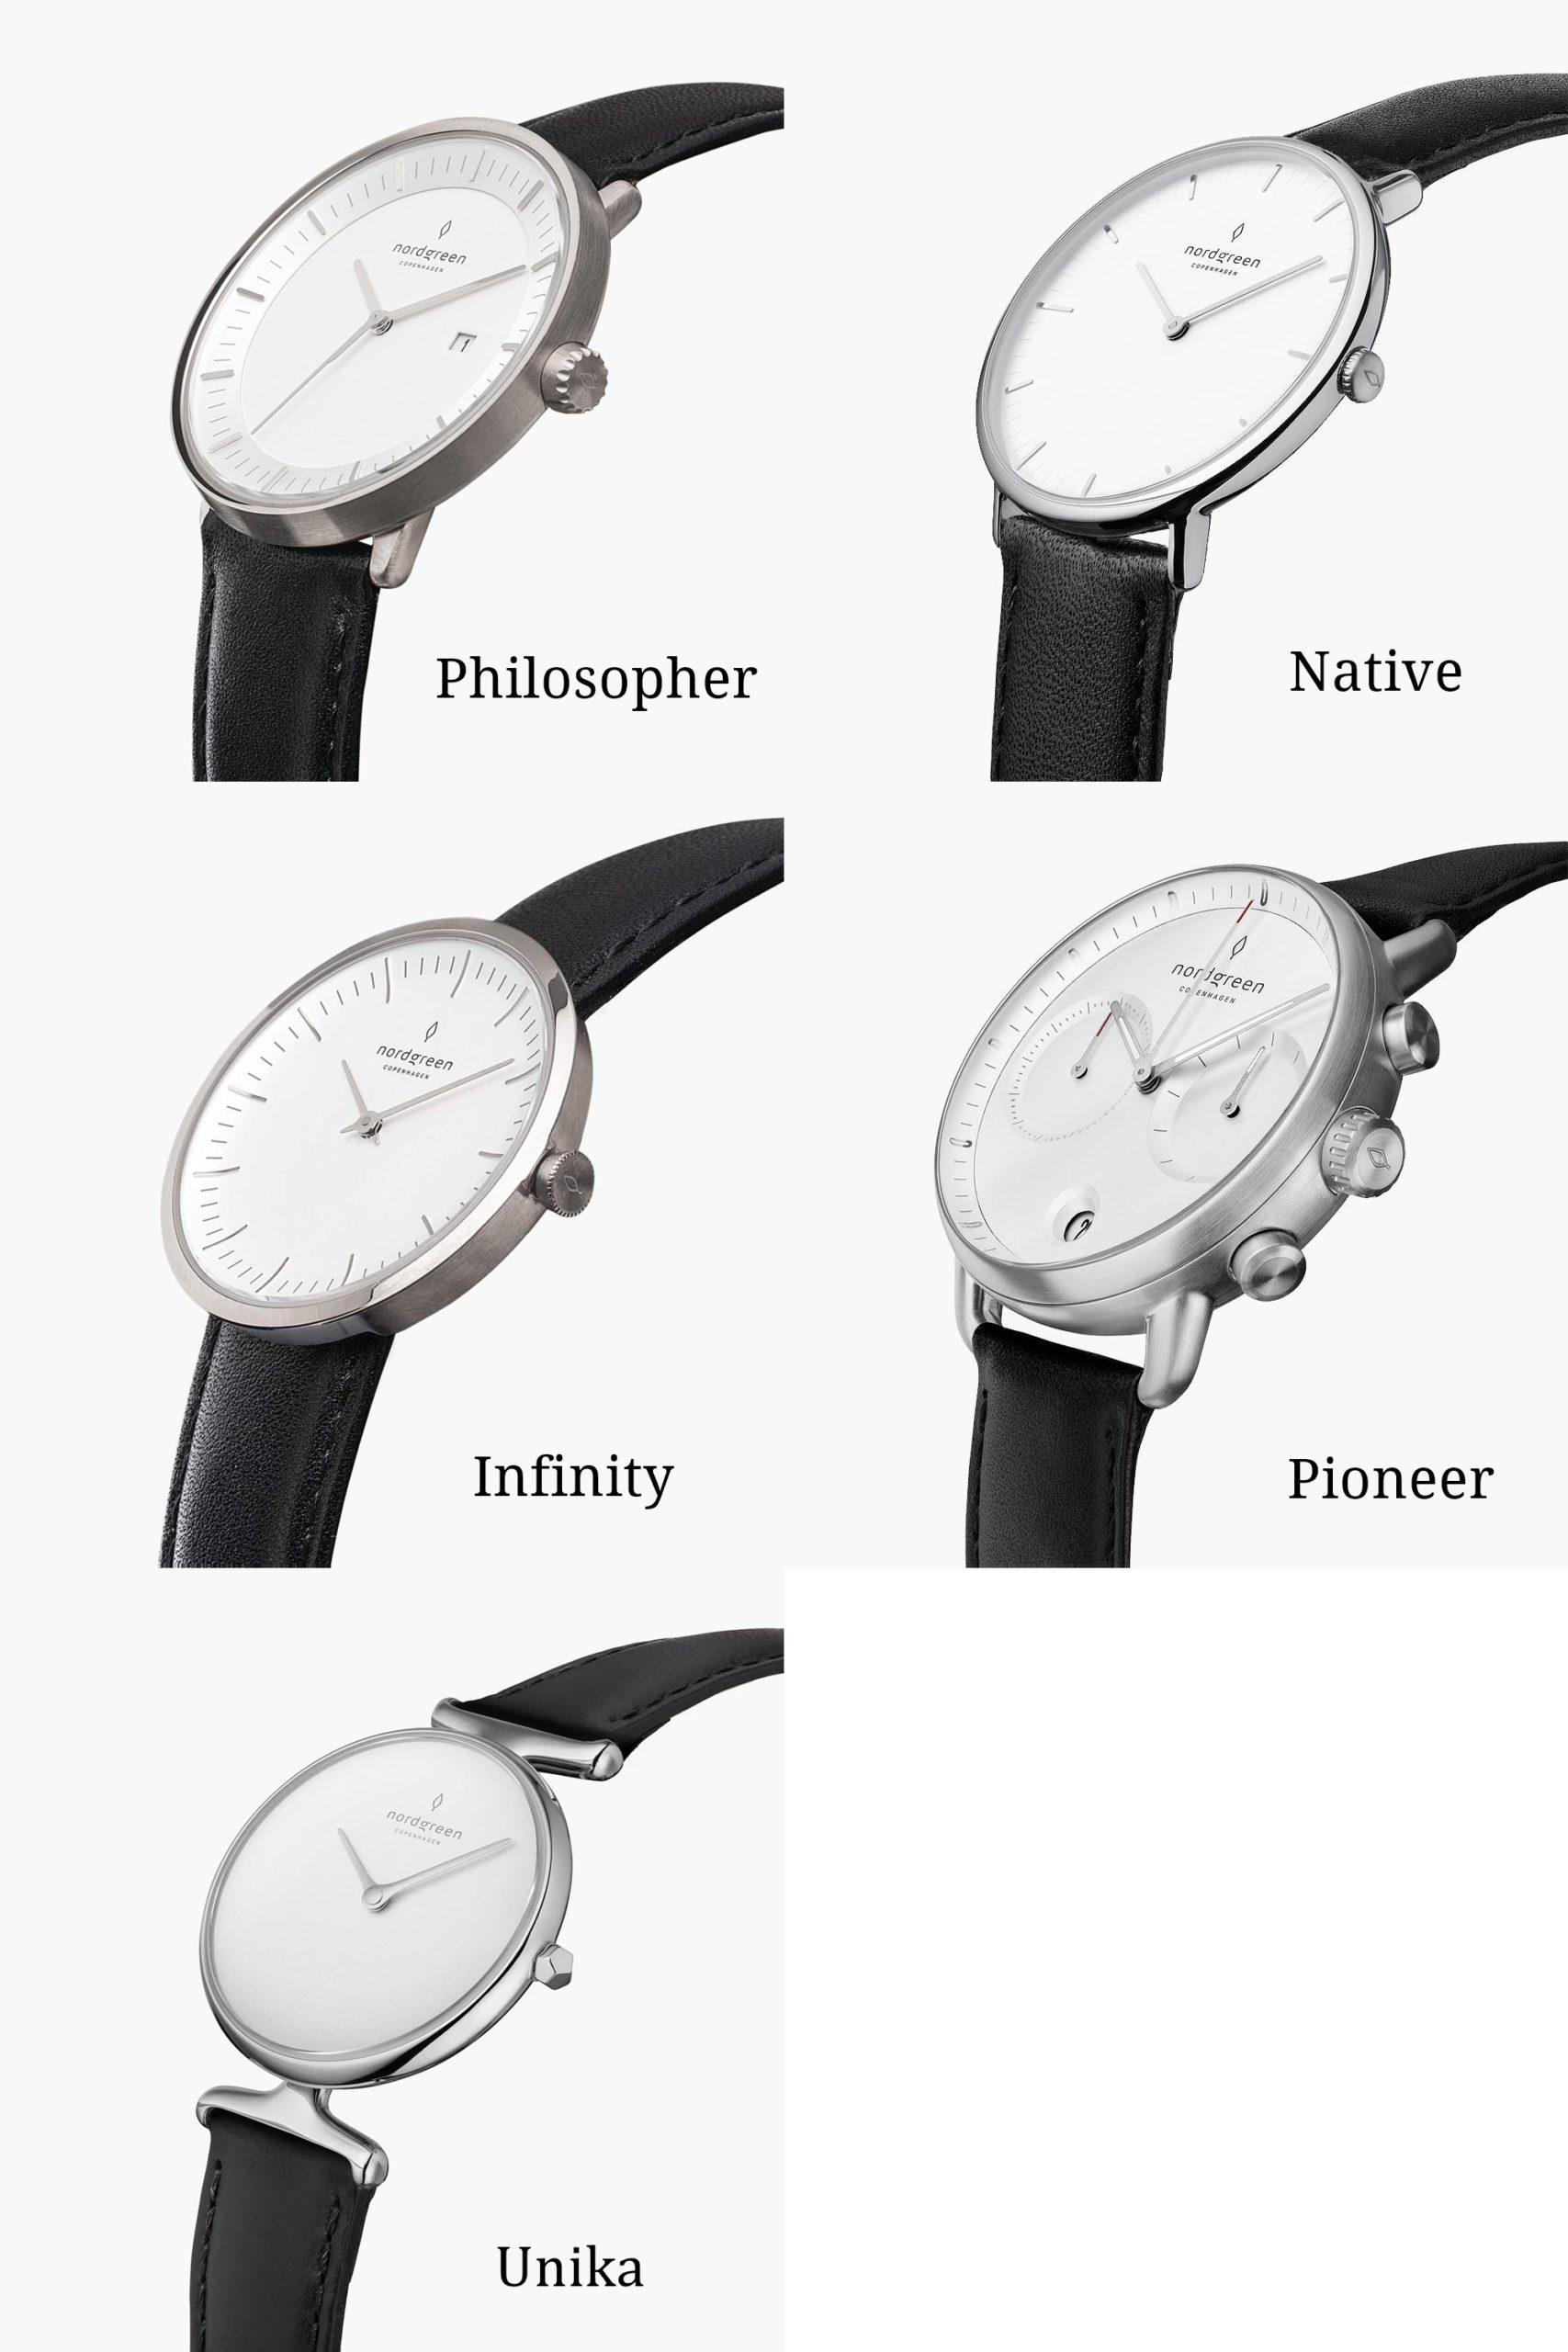 Nordgreen(ノードグリーン) Philosopher・Native・Infinity・Pioneer・Unikaのデザインを比較